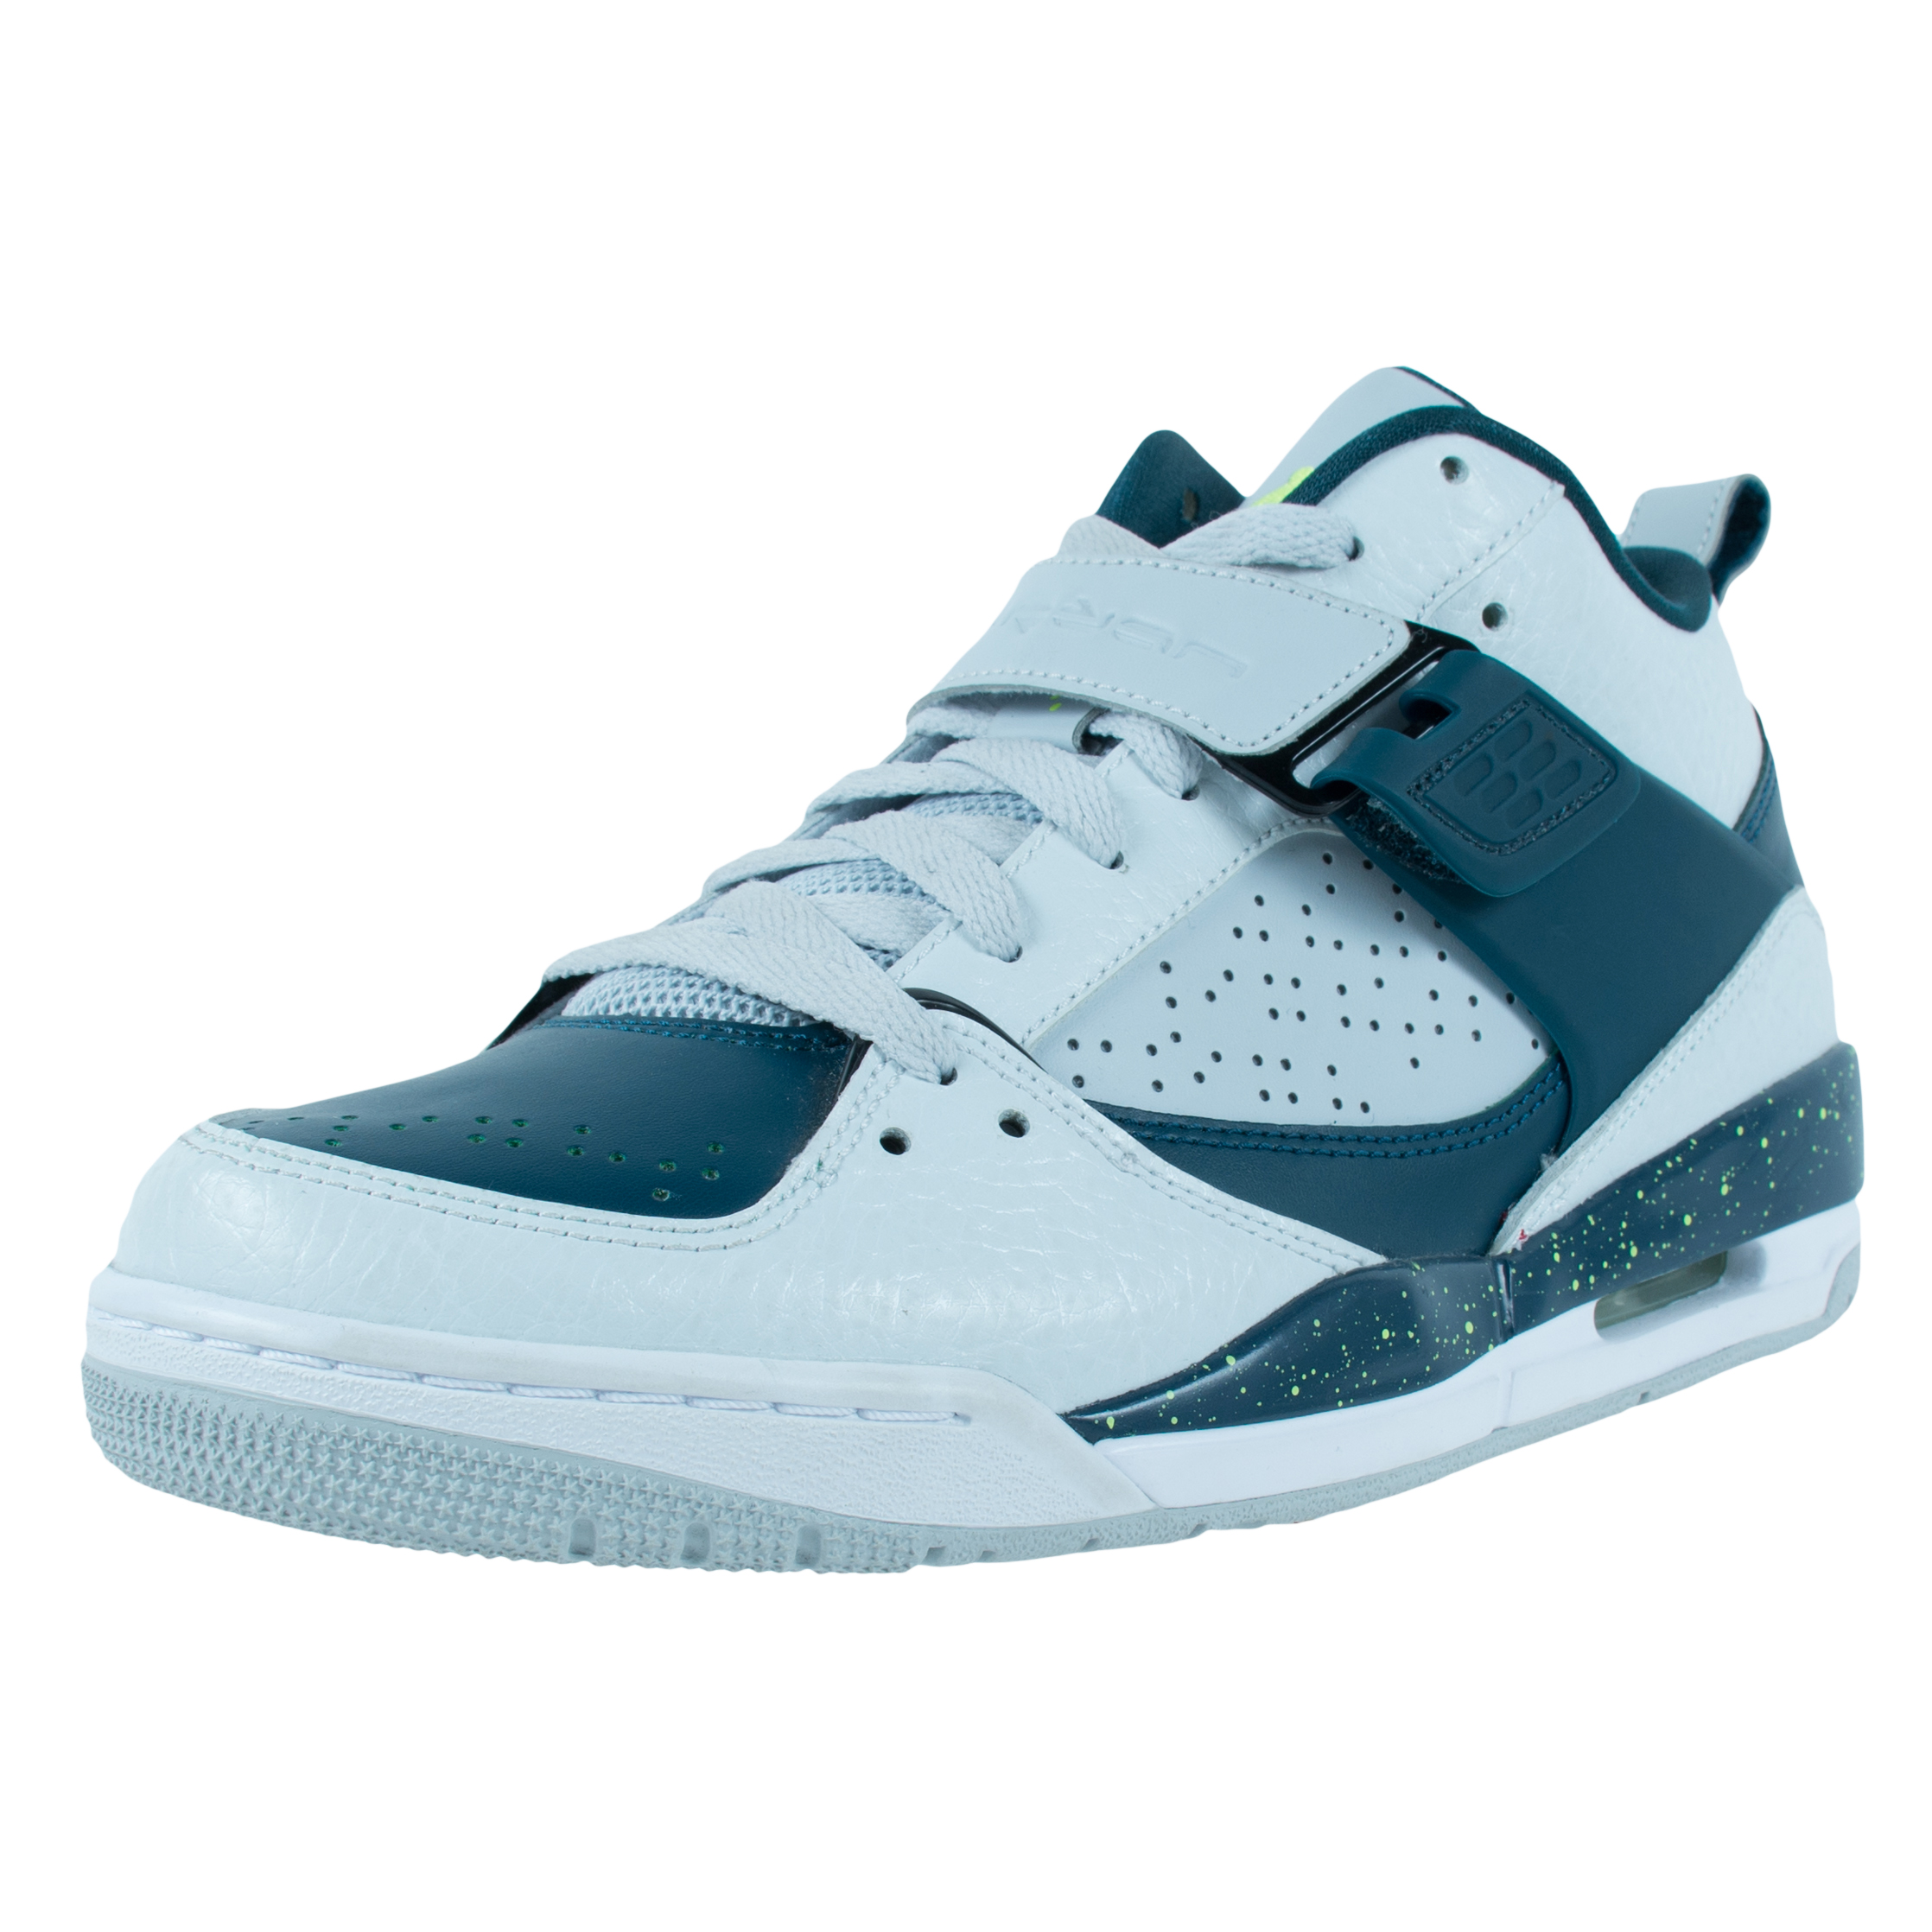 Nike JORDAN FLIGHT 45 BASKETBALL SHOES PURE PLATINUM VOLT...